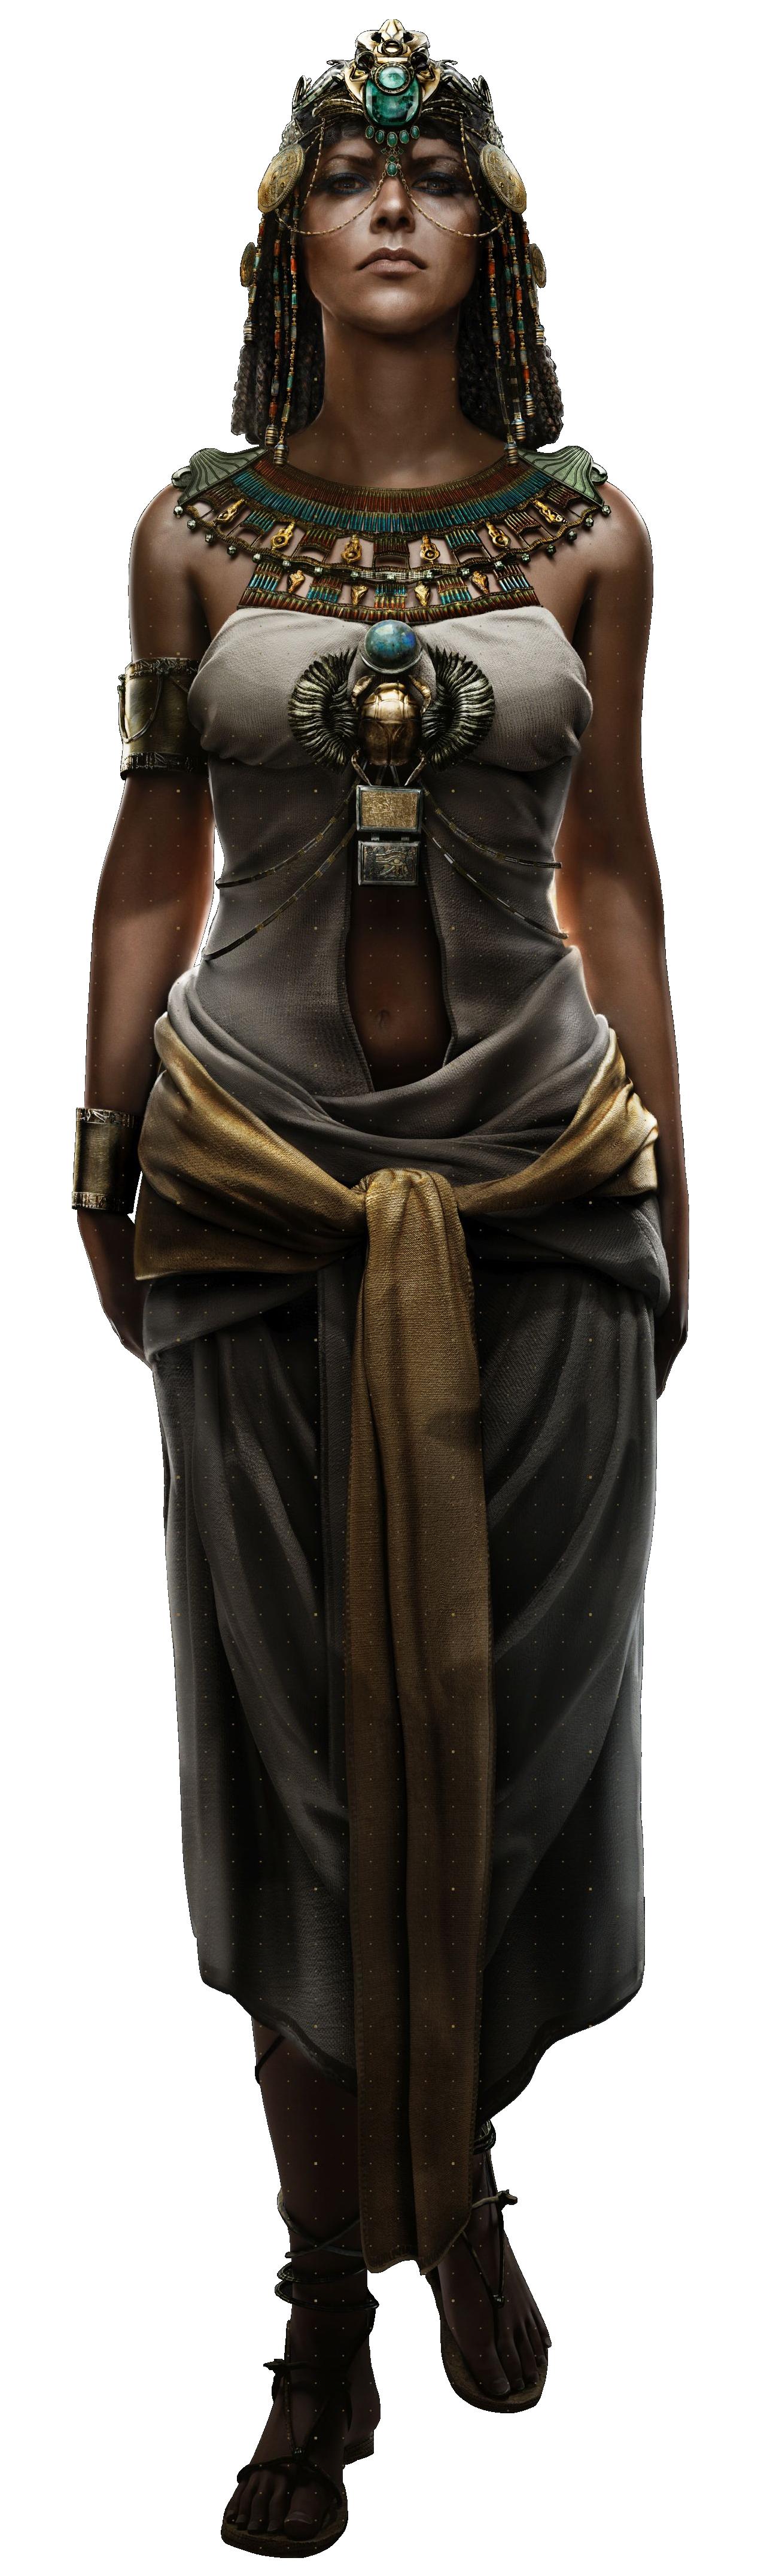 Cleopatra Render